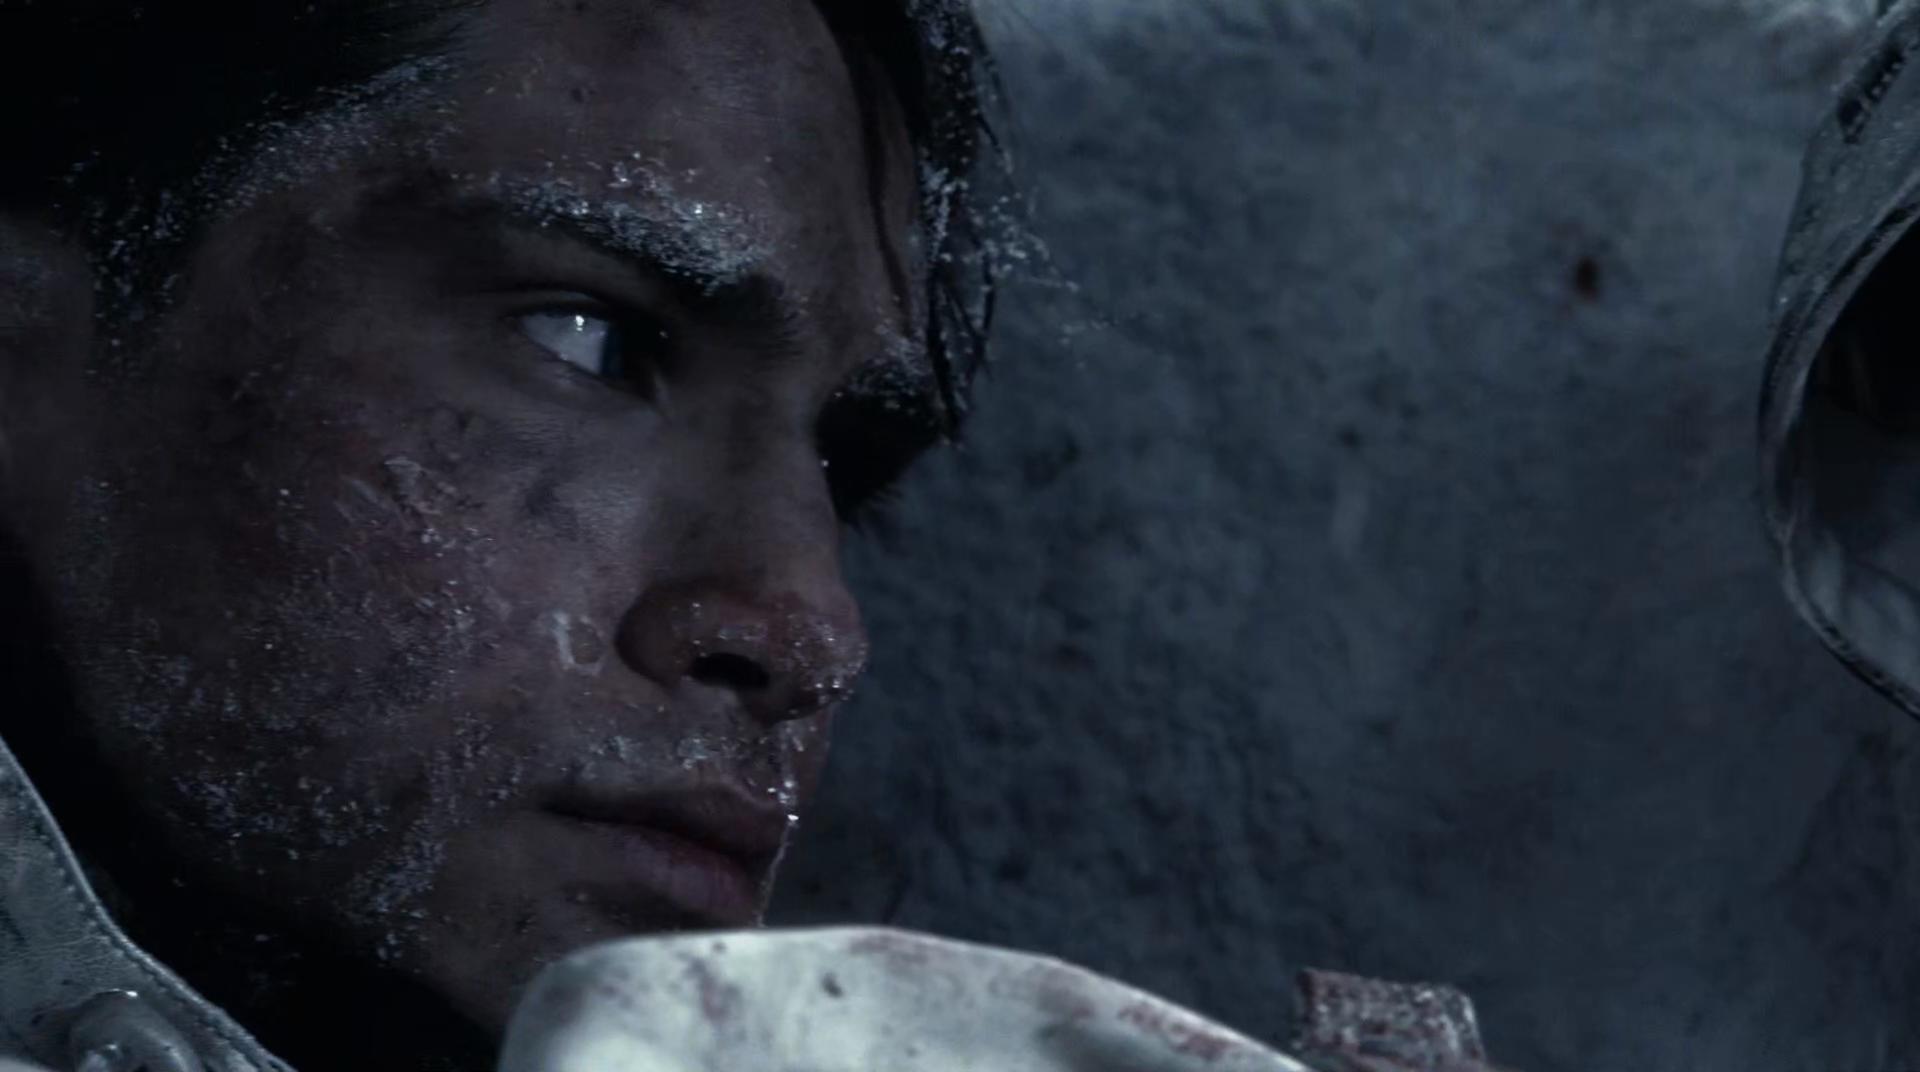 Battlestar Galactica Blood And Chrome 2012 BluRay 1080p Dts HEVC-d3g.mkv_snapshot_01.23.03.000.jpg